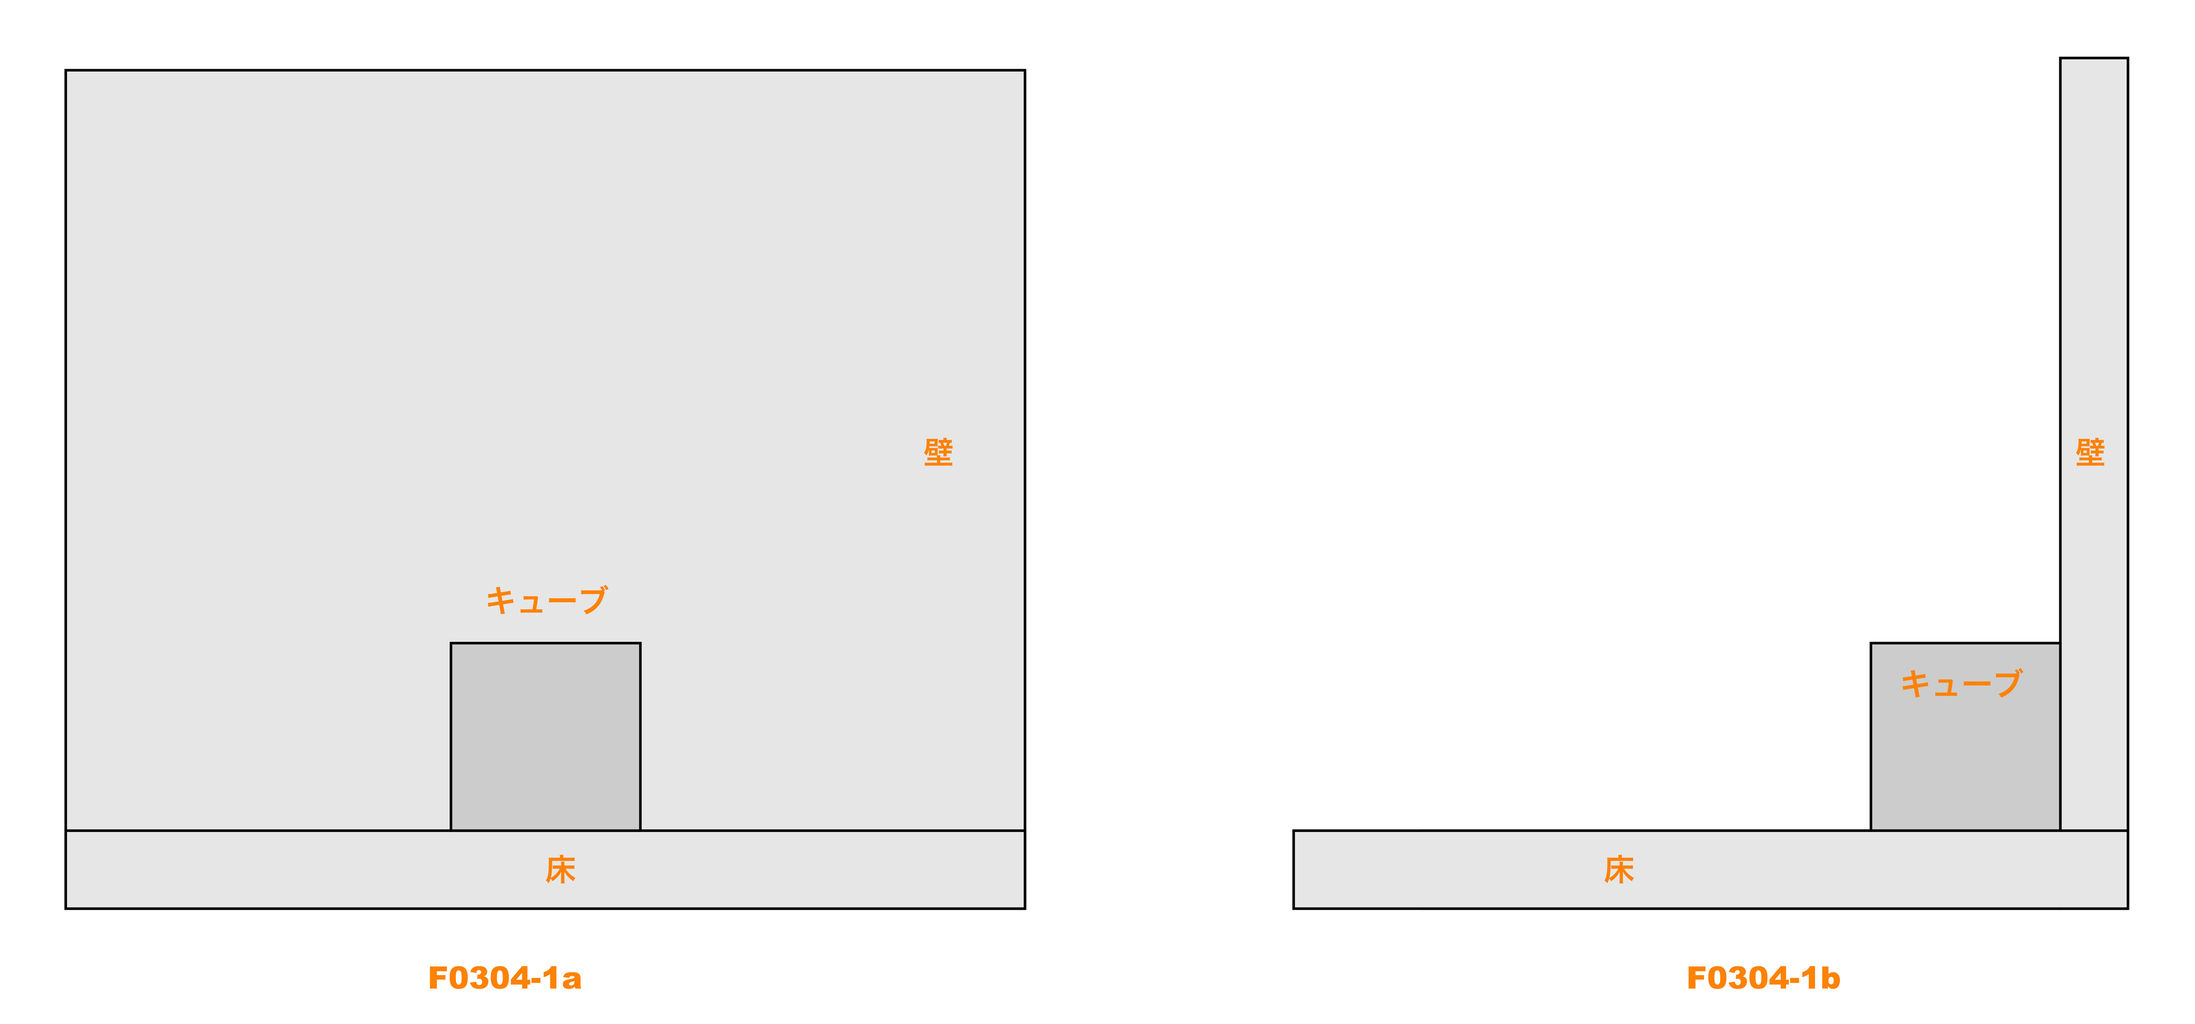 Shoyamao's rehabilitation   上面+側面二面の三面rとして顕われるキューブ [0304] コメント